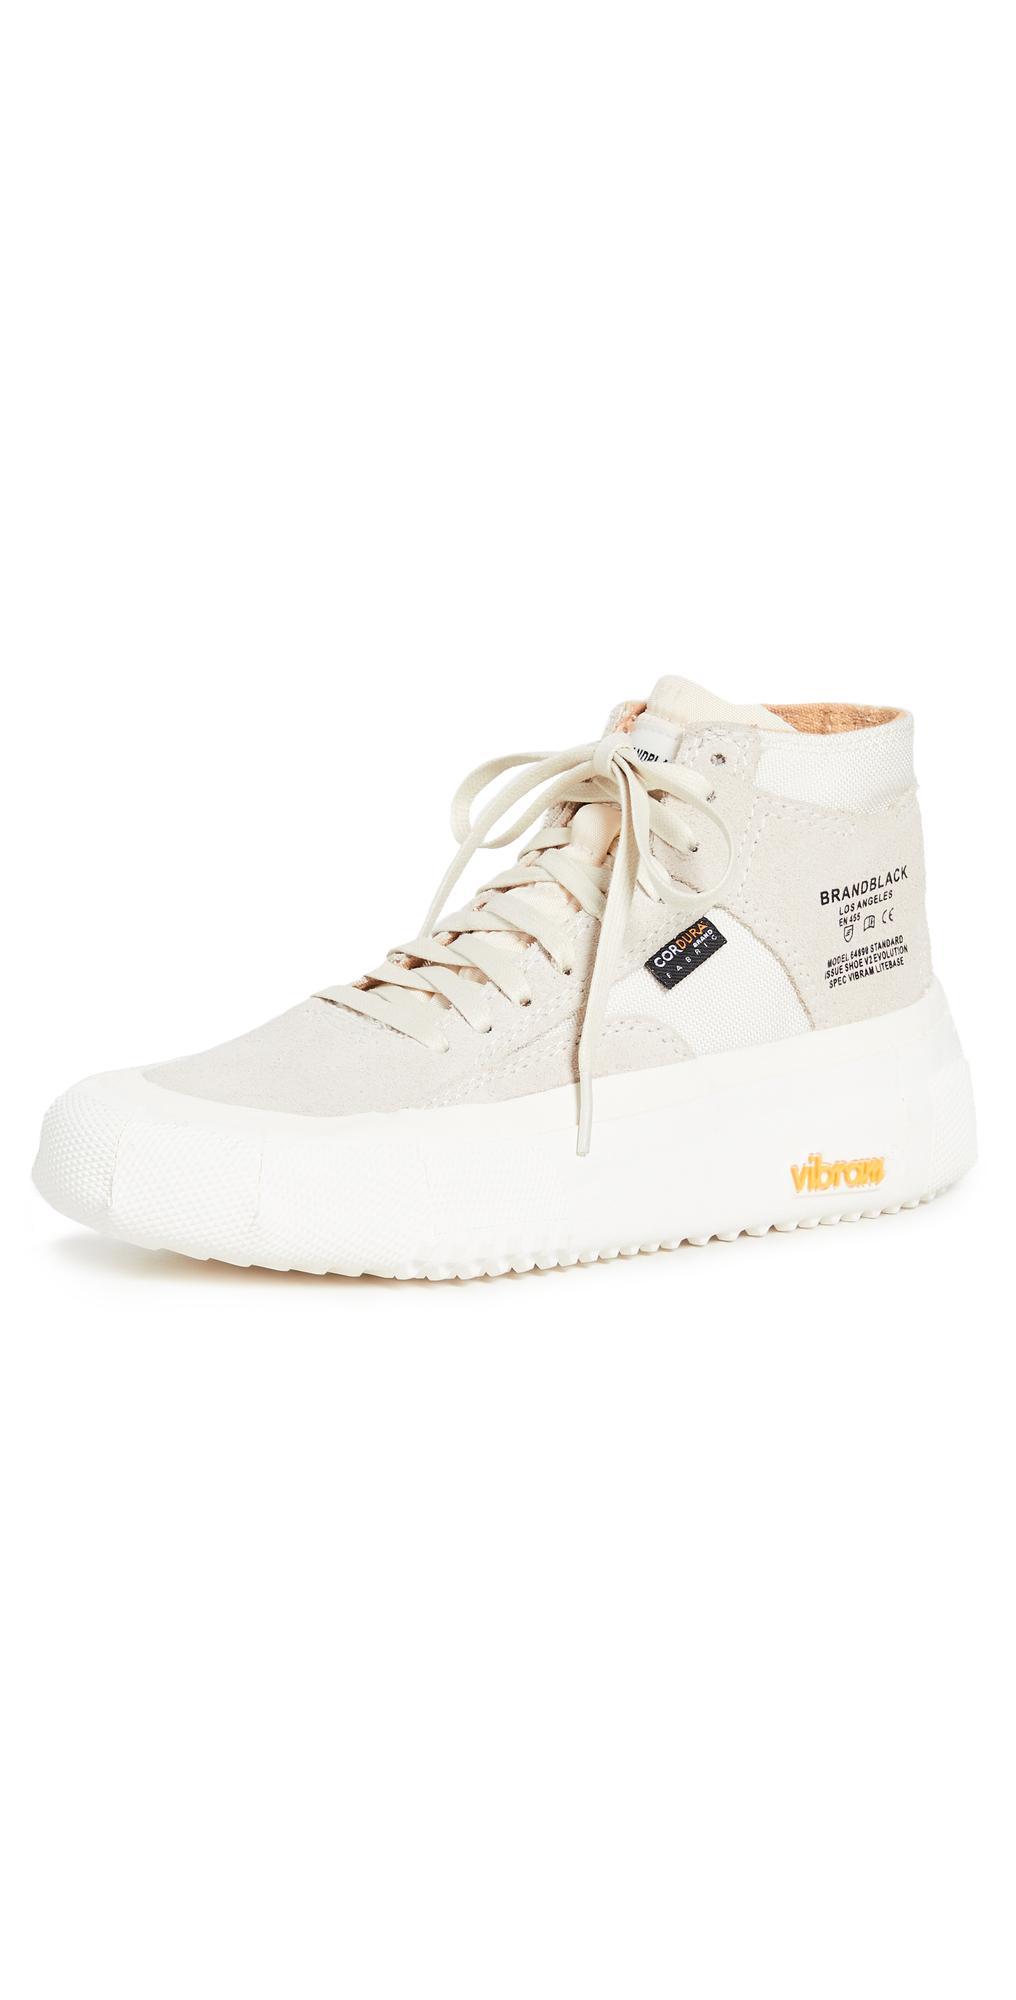 Capo High Top Sneakers